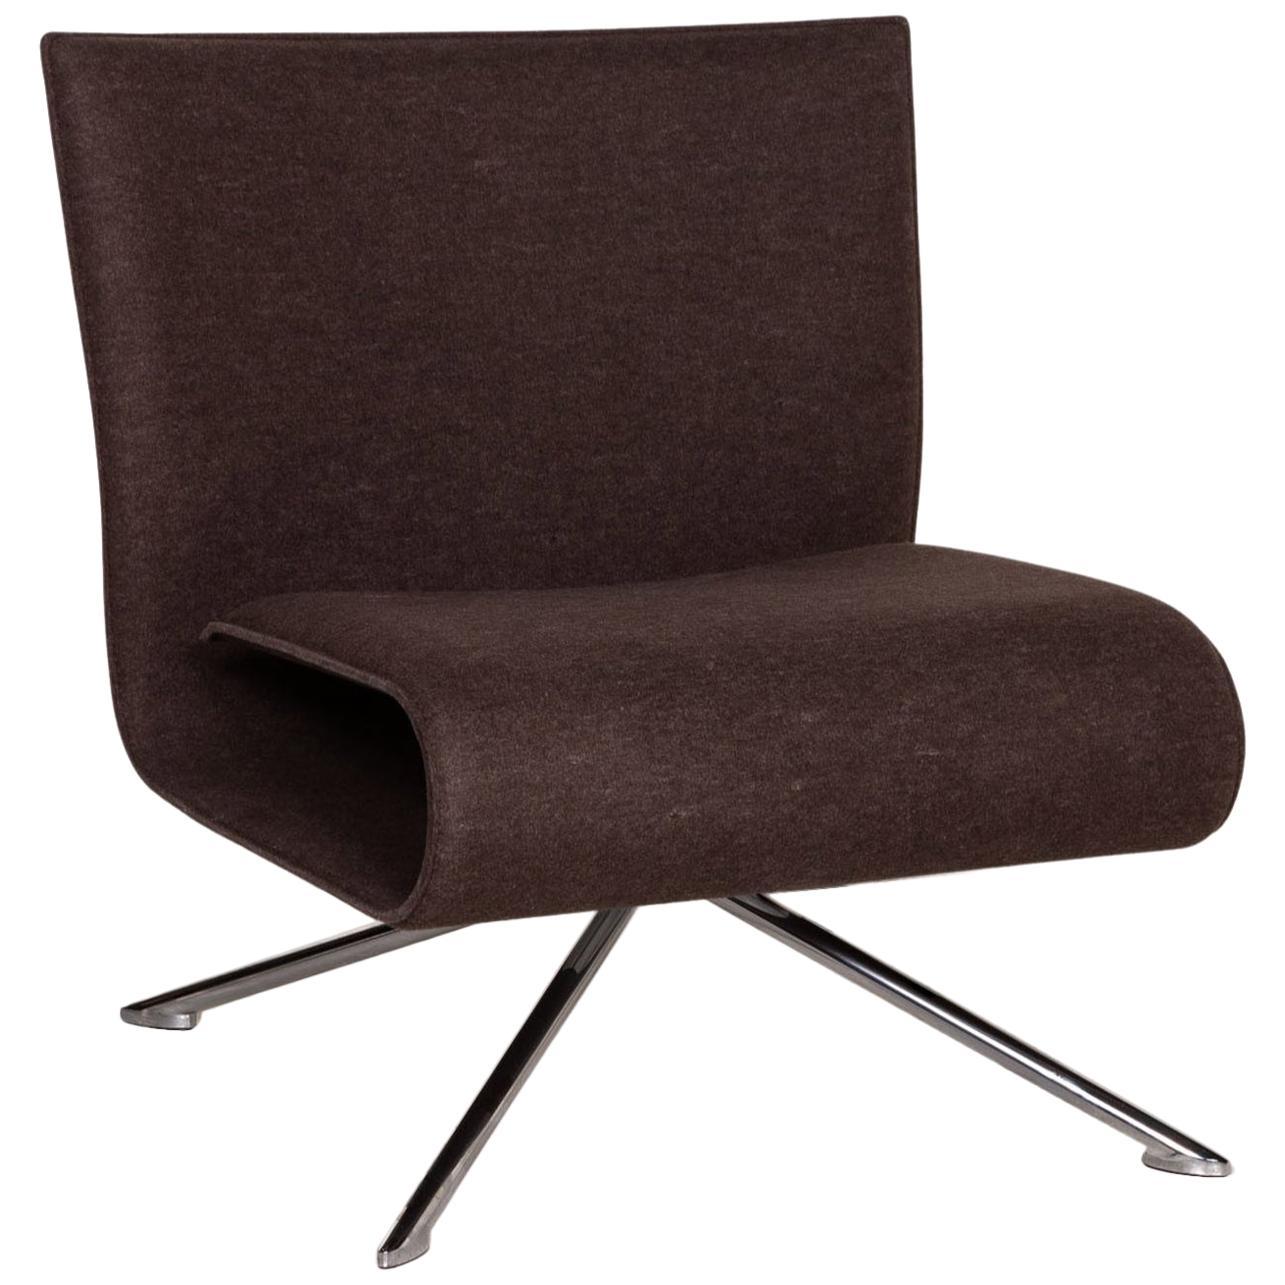 HOB Easychair by VERTIJET for COR Designer Armchair, Felt Fabric, Brown, Molded